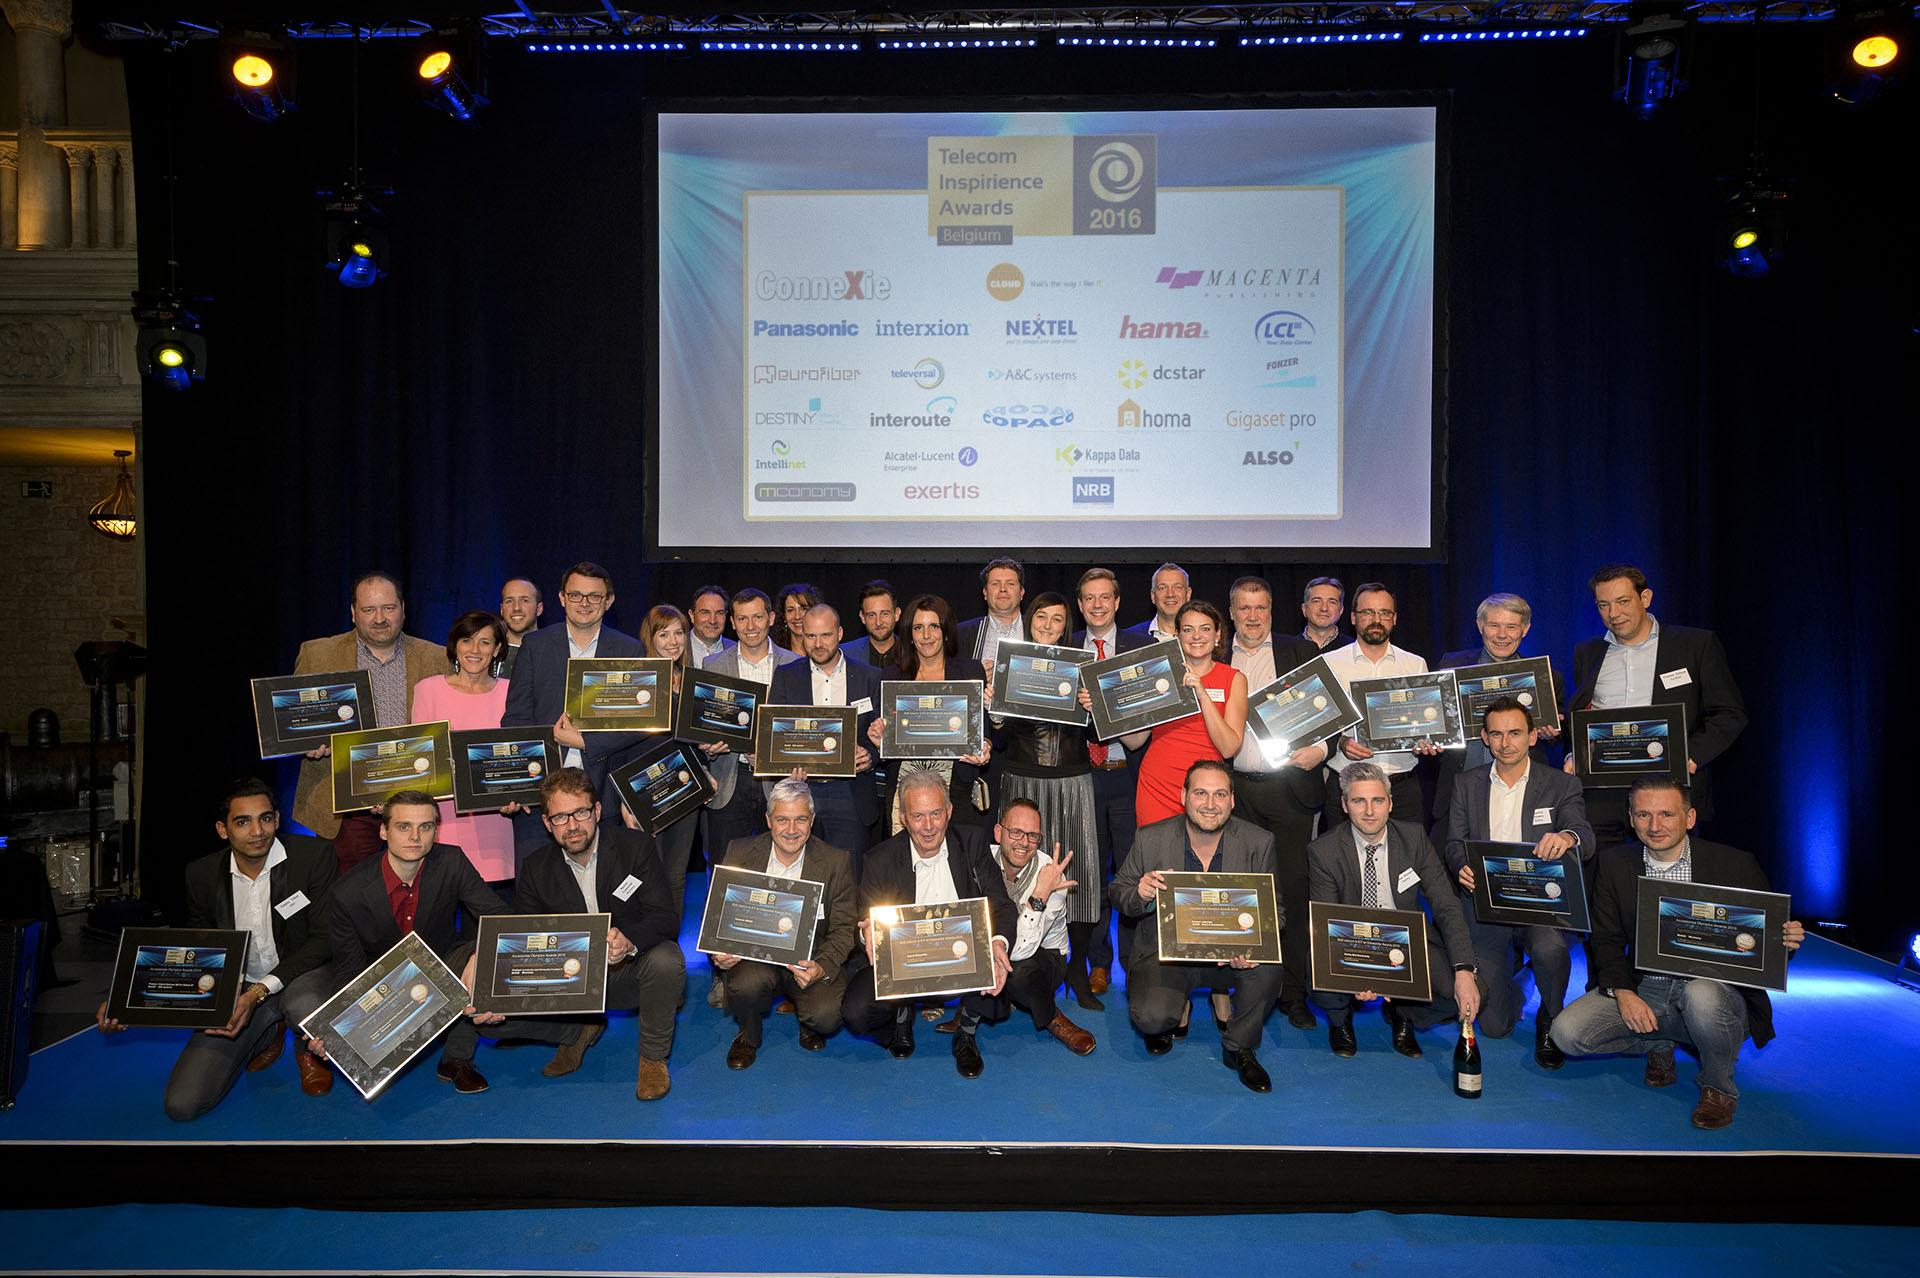 ConneXie reikt opnieuw de Telecom Inspirience Awards uit